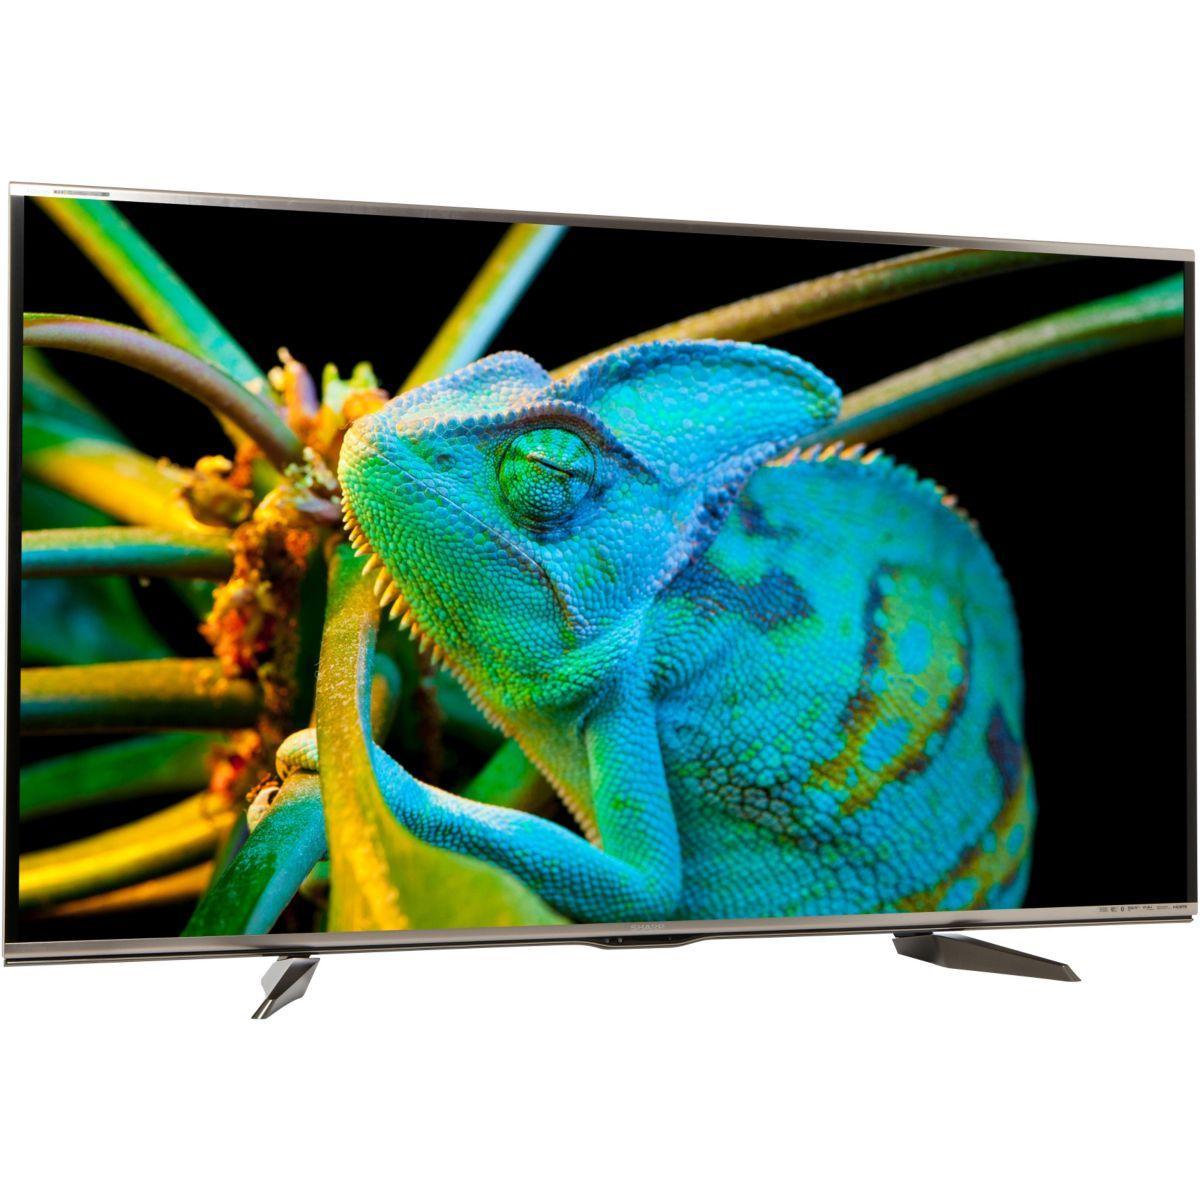 TV SHARP LC-70UQ10E 3D SMART TV QUATTRON